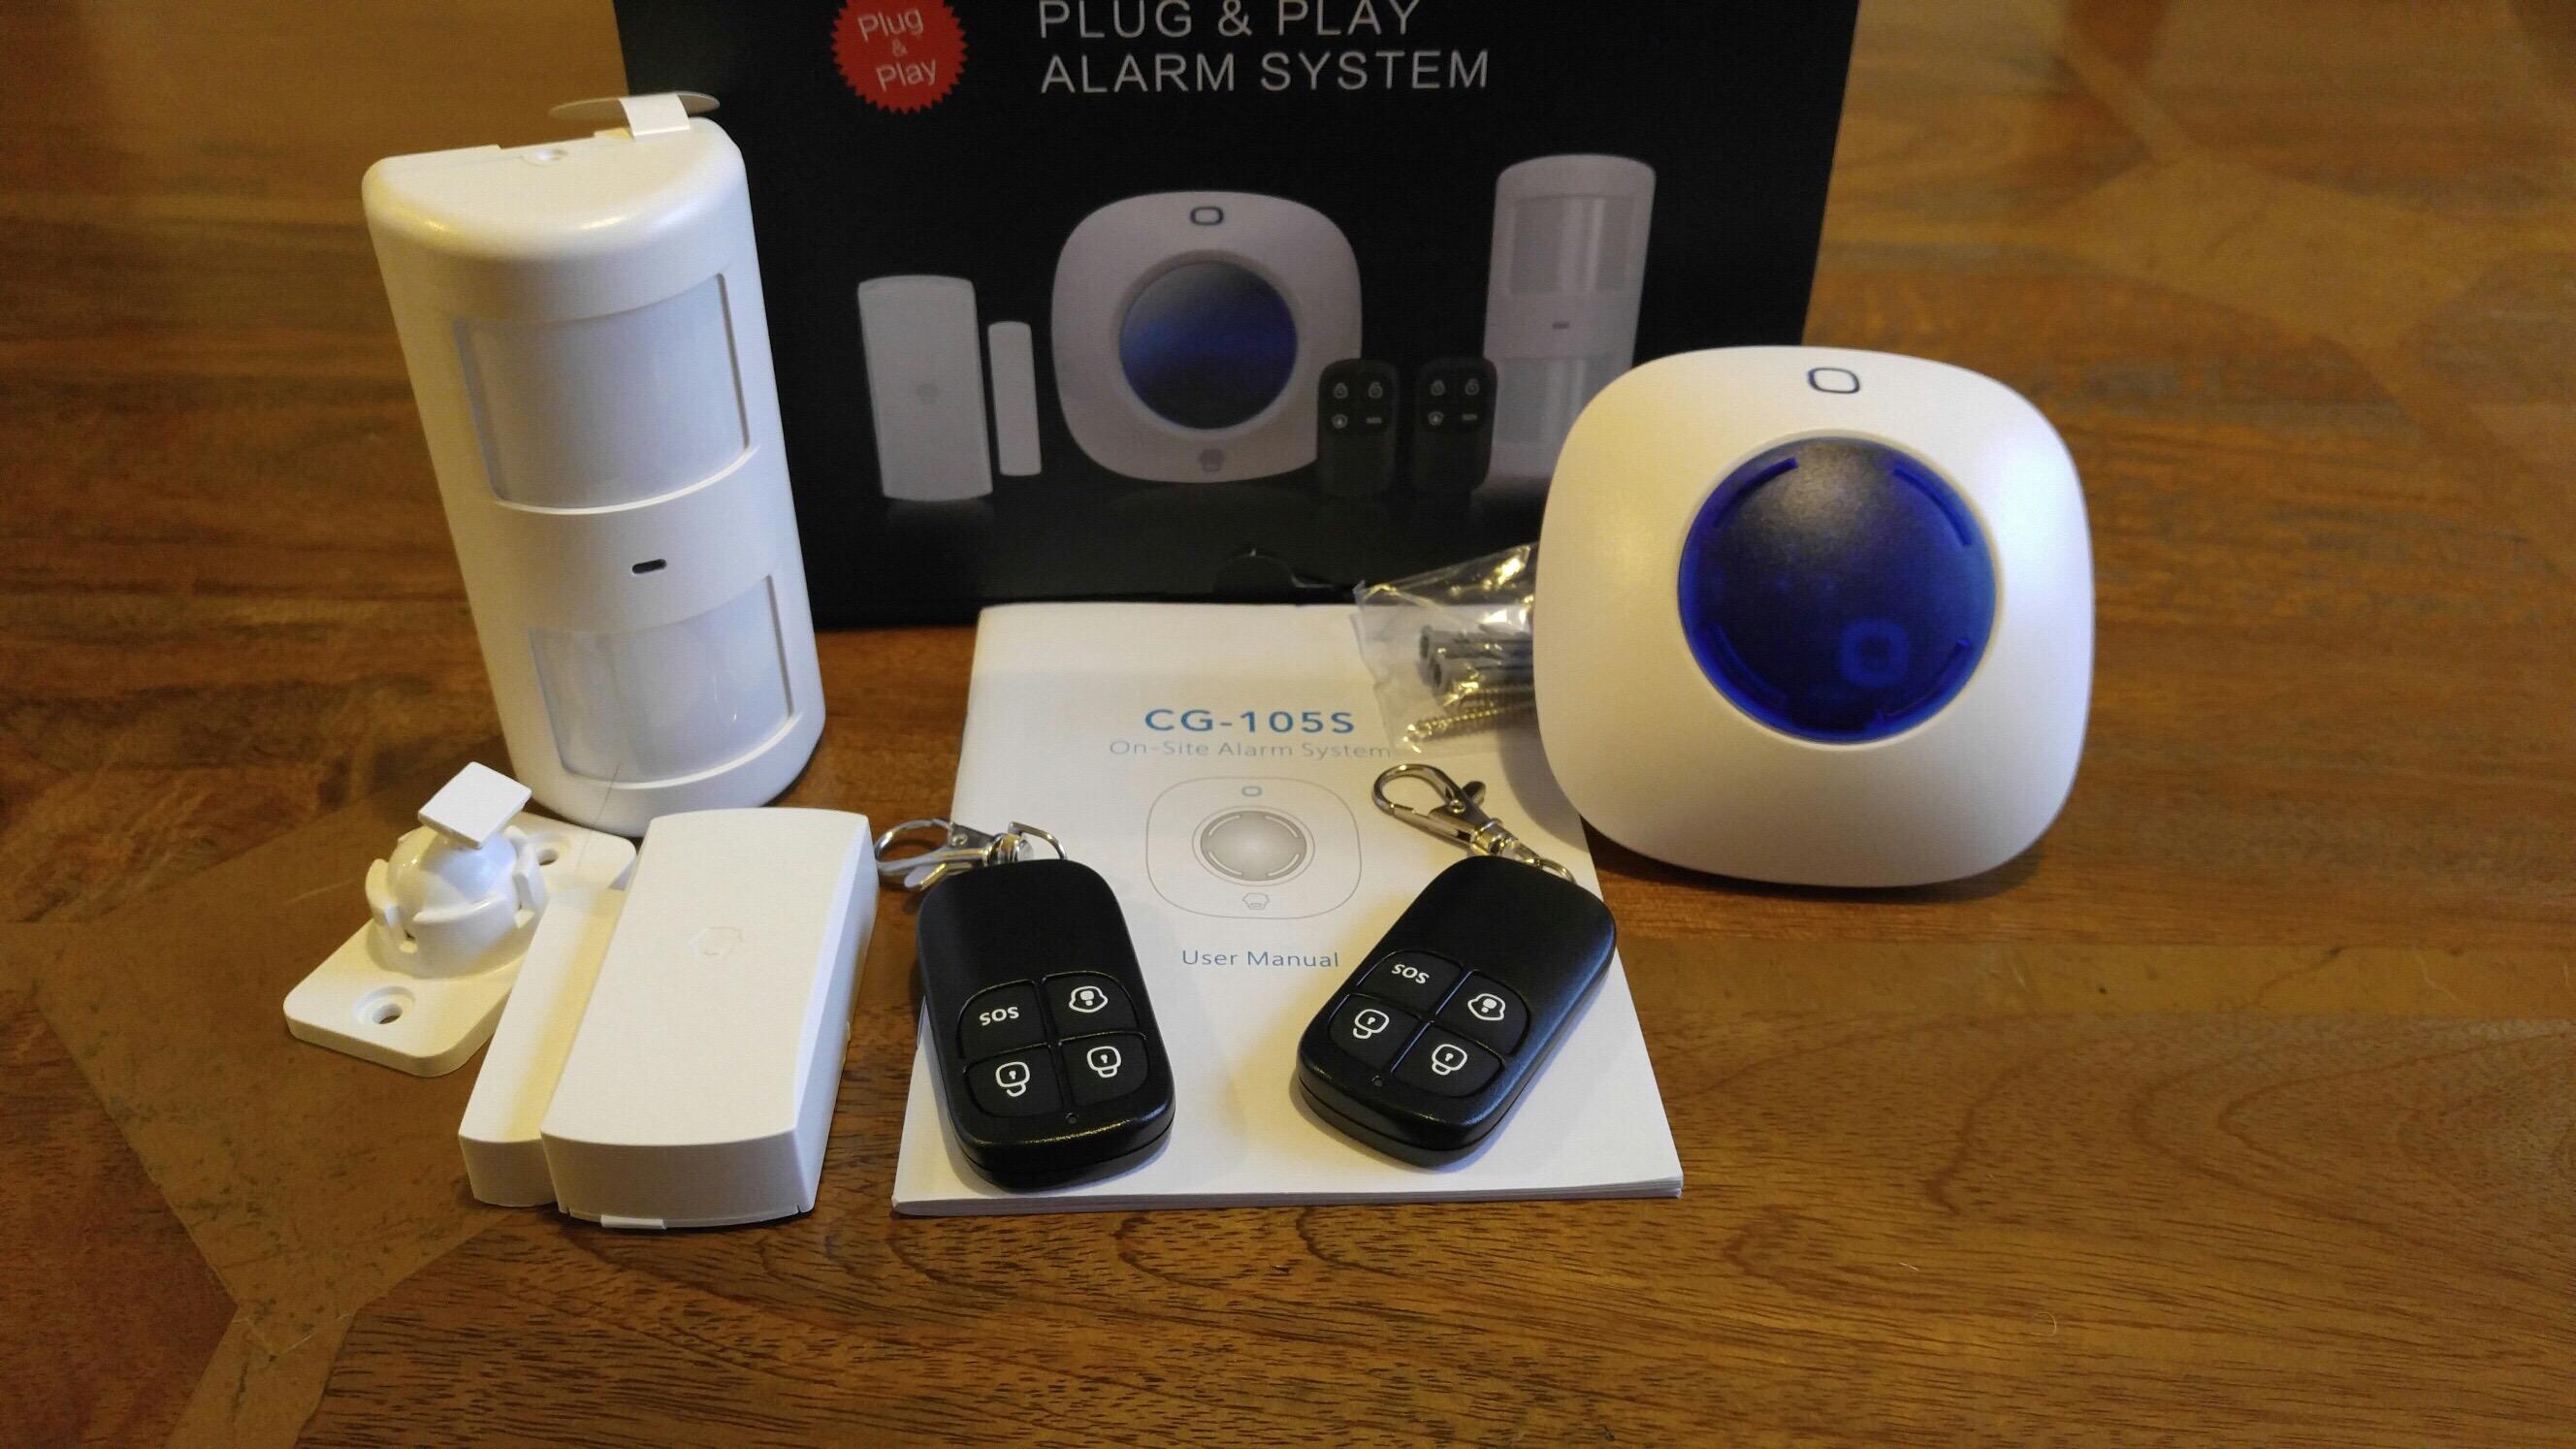 miguard a105 diy alarm system my review gavin 39 s gadgets. Black Bedroom Furniture Sets. Home Design Ideas